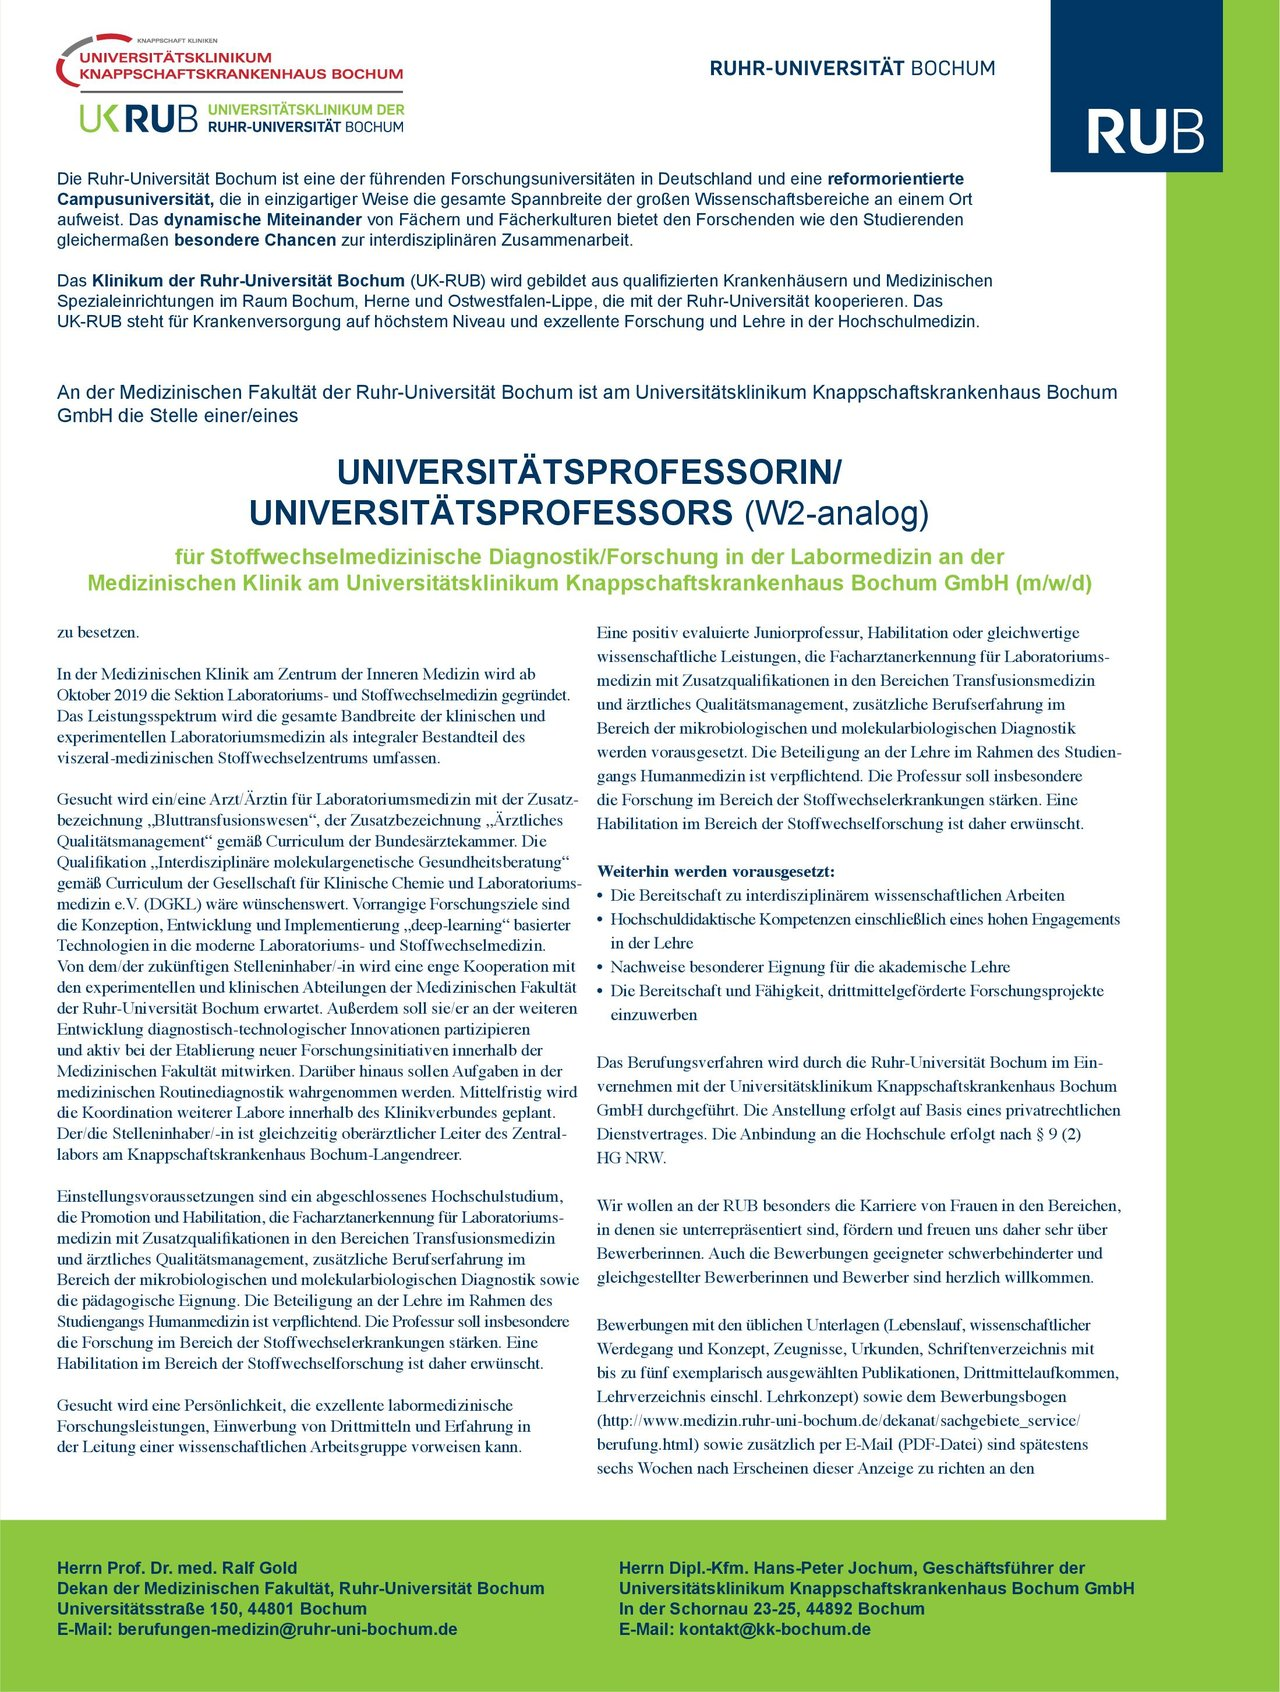 Ruhr-Universität Bochum - Ruhr-Universität Bochum Universitätsprofessorin/Universitätsprofessor (W2-analog) Laboratoriumsmedizin, Transfusionsmedizin Arzt / Facharzt, Professor